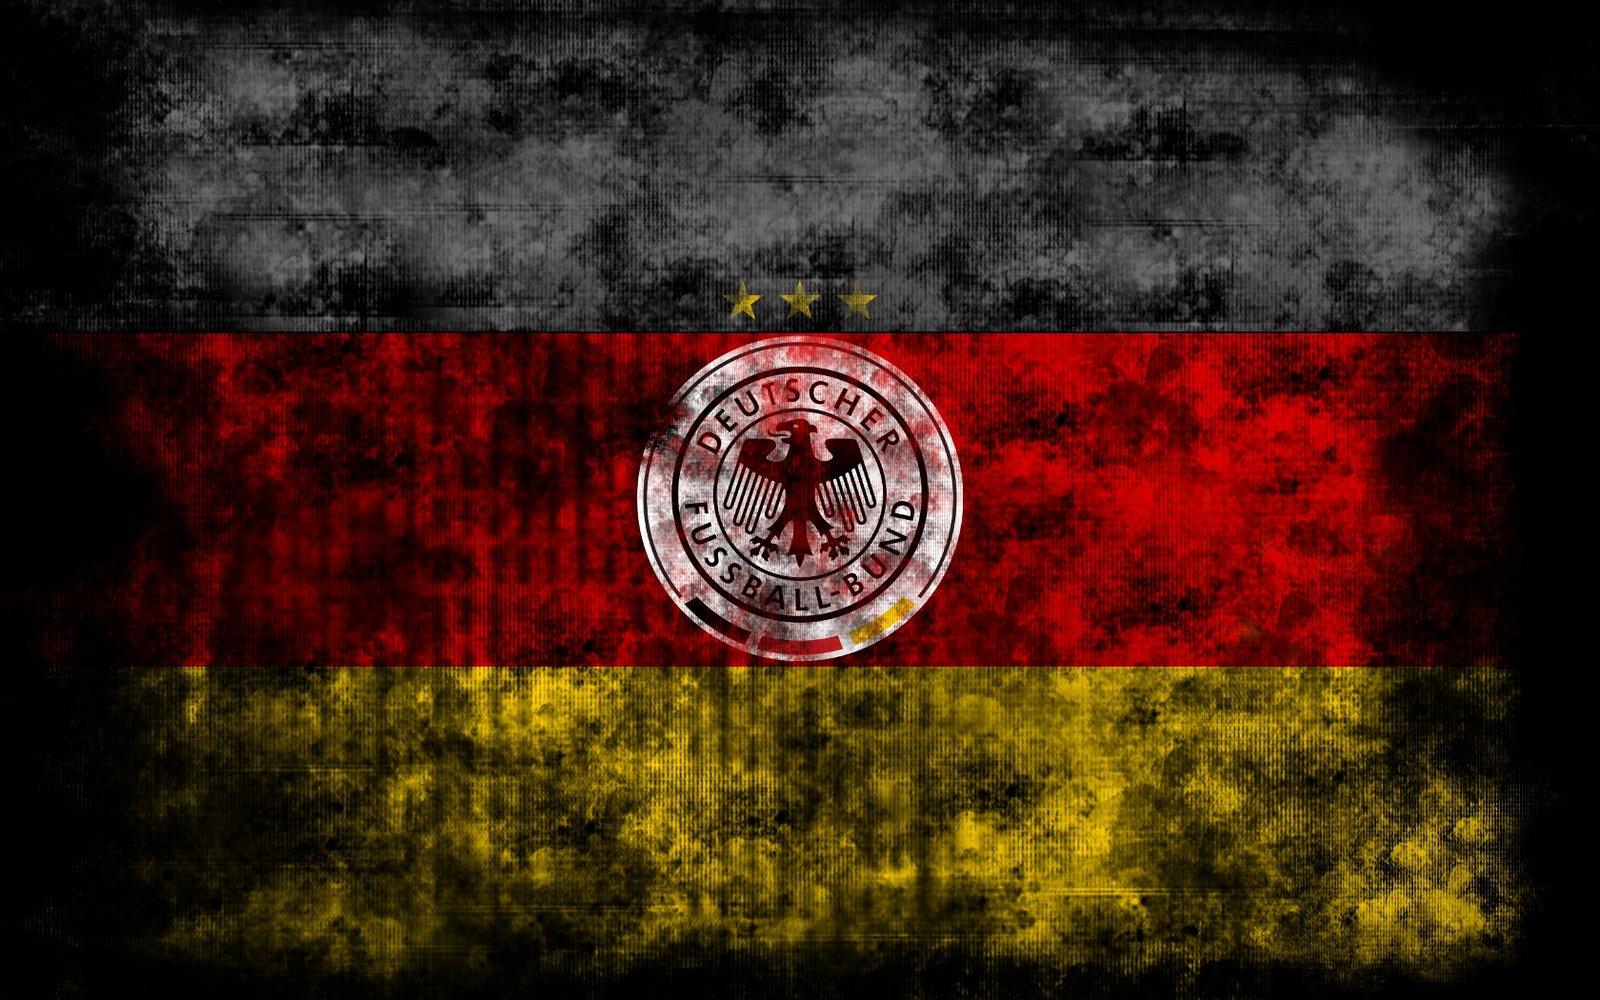 Germany Flag Full HD Wallpaper 3707 Wallpaper computer best website 1600x1000